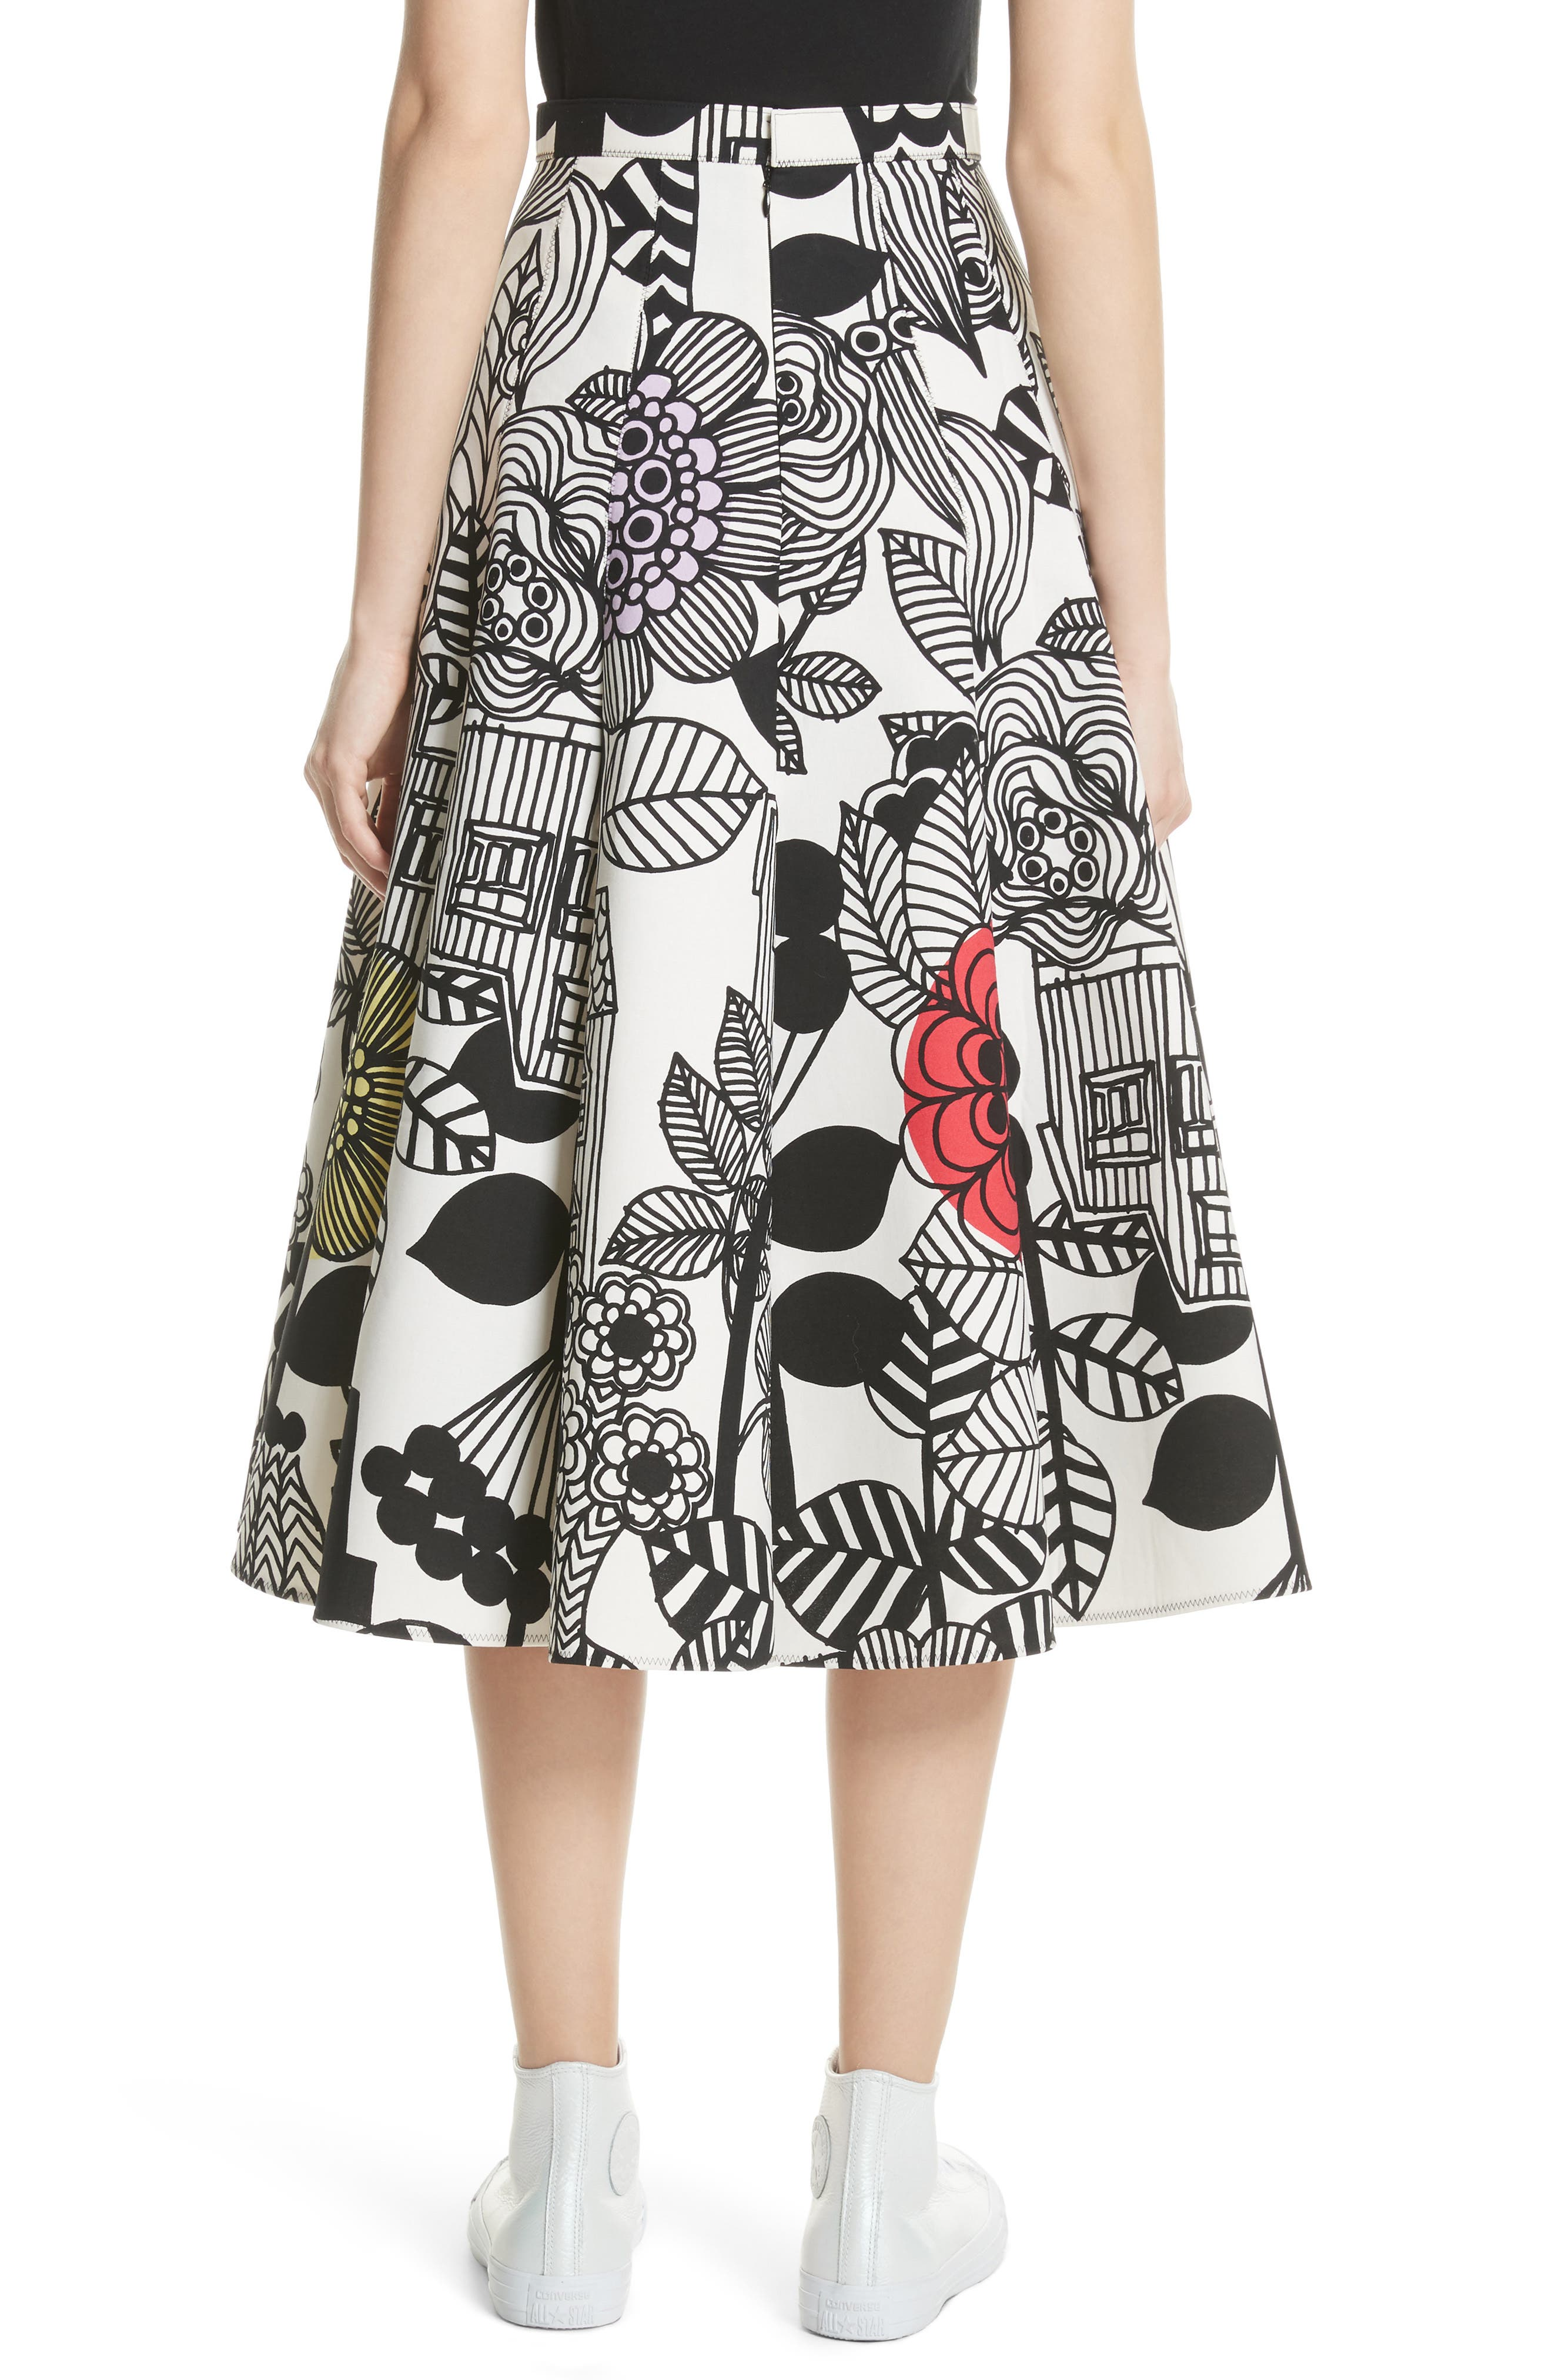 x Marimekko Vegetable Print Cotton Skirt,                             Alternate thumbnail 2, color,                             Wht/ Blk/ Ylw